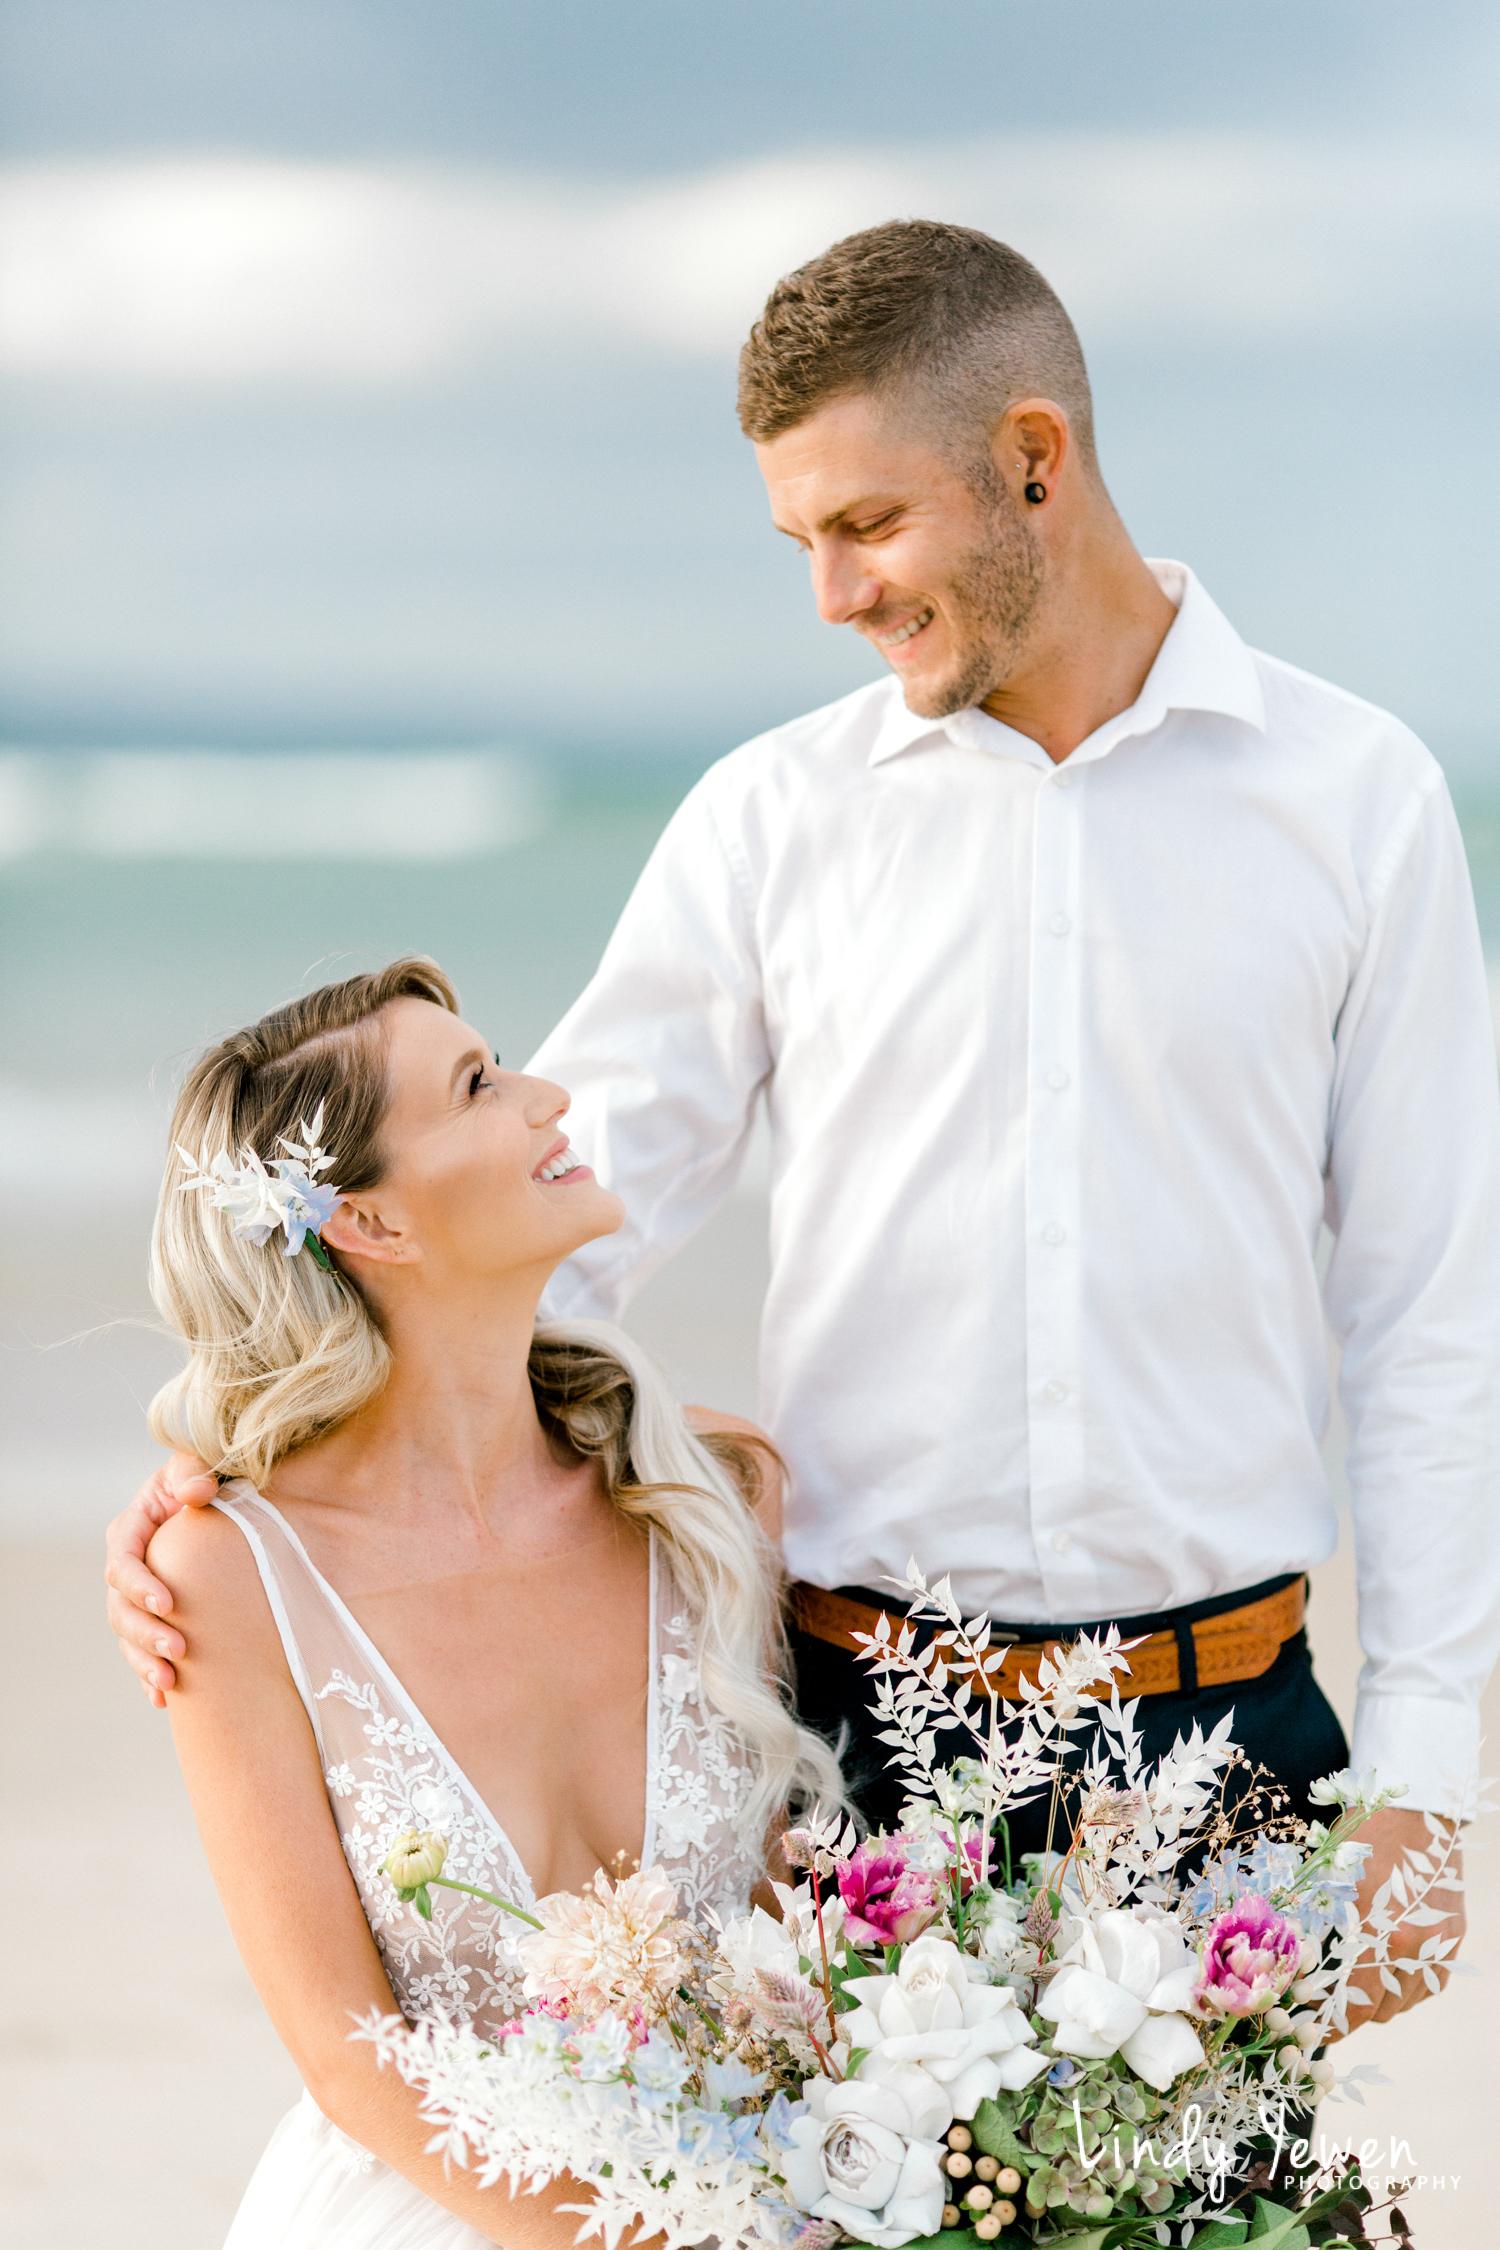 Lindy-Photography-Noosa-Weddings-Grace-Chris 59.jpg